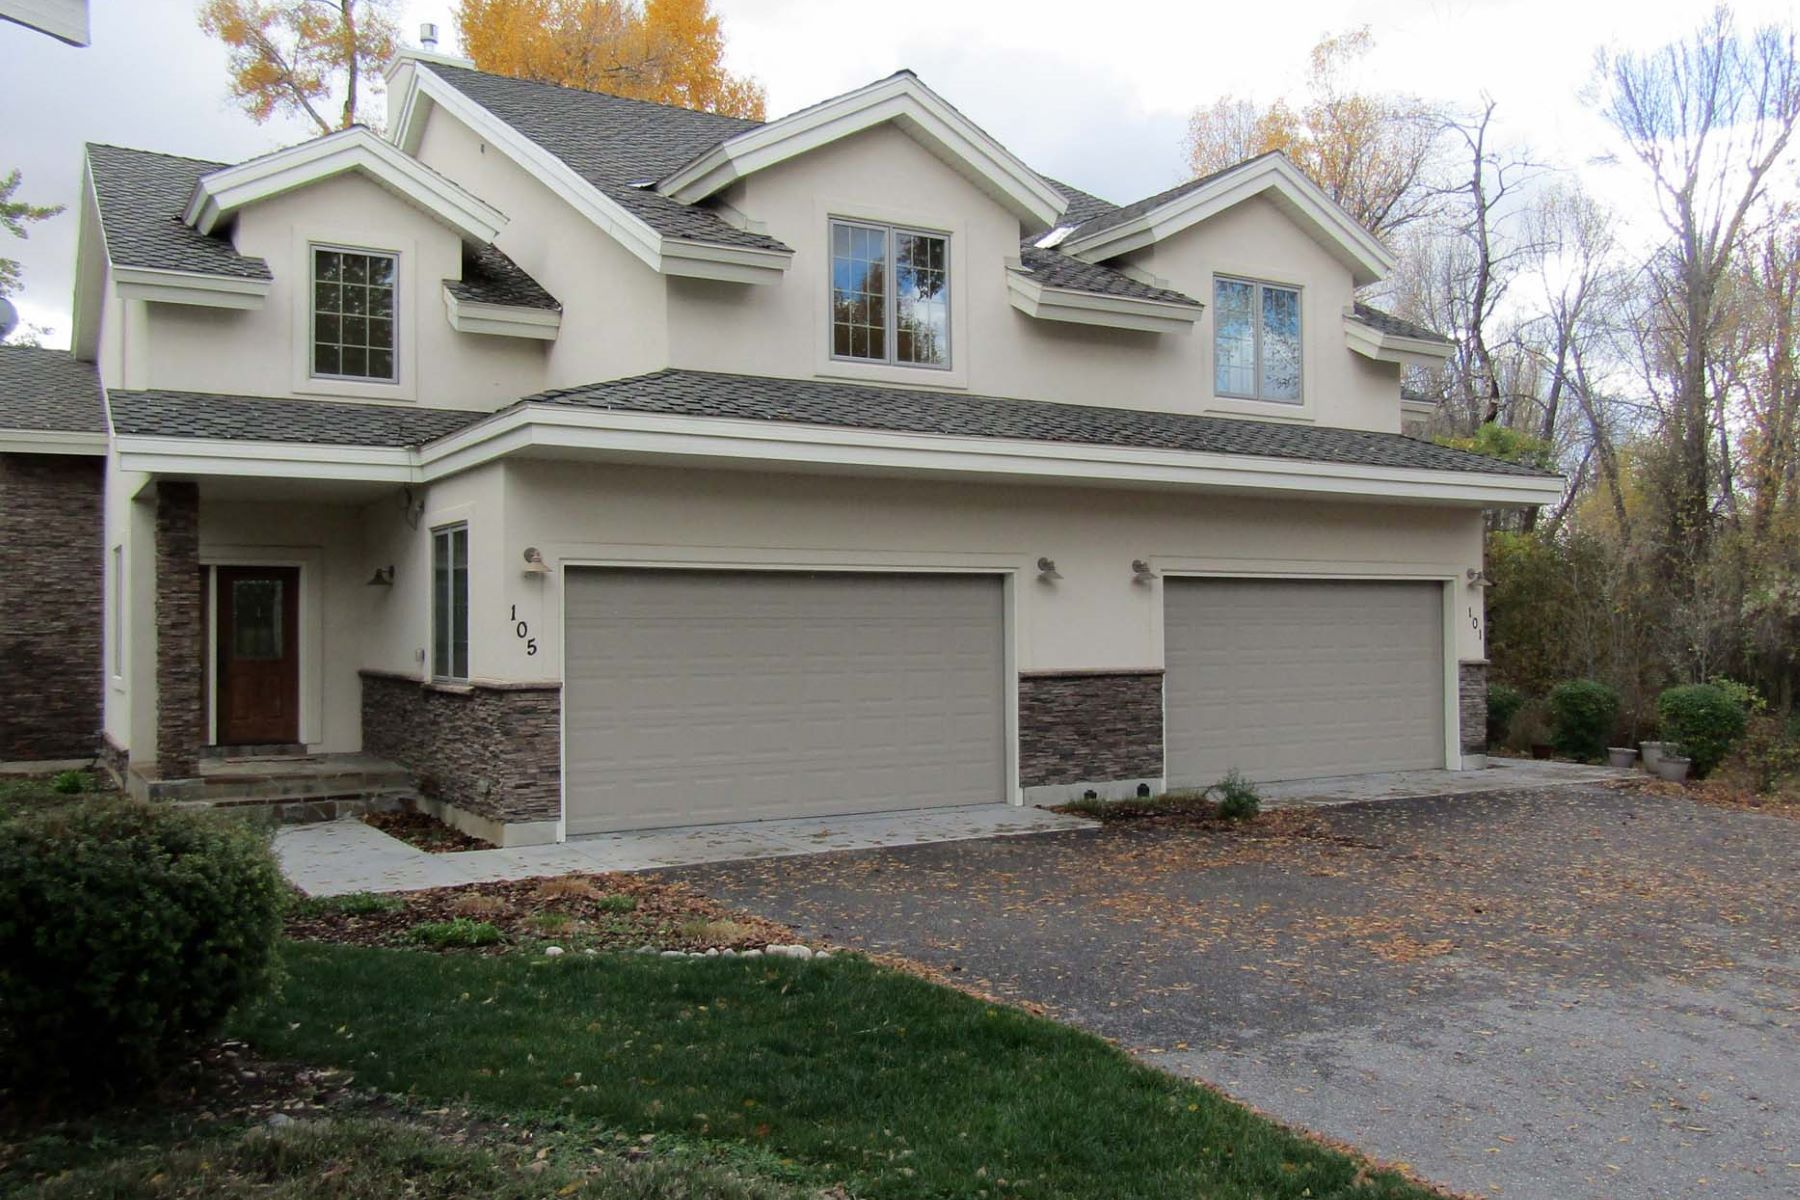 联栋屋 为 销售 在 Dramatic Yes! Expensive No! 105 Cobble Creek Lane 德里格斯, 爱达荷州, 83422 Jackson Hole, 美国